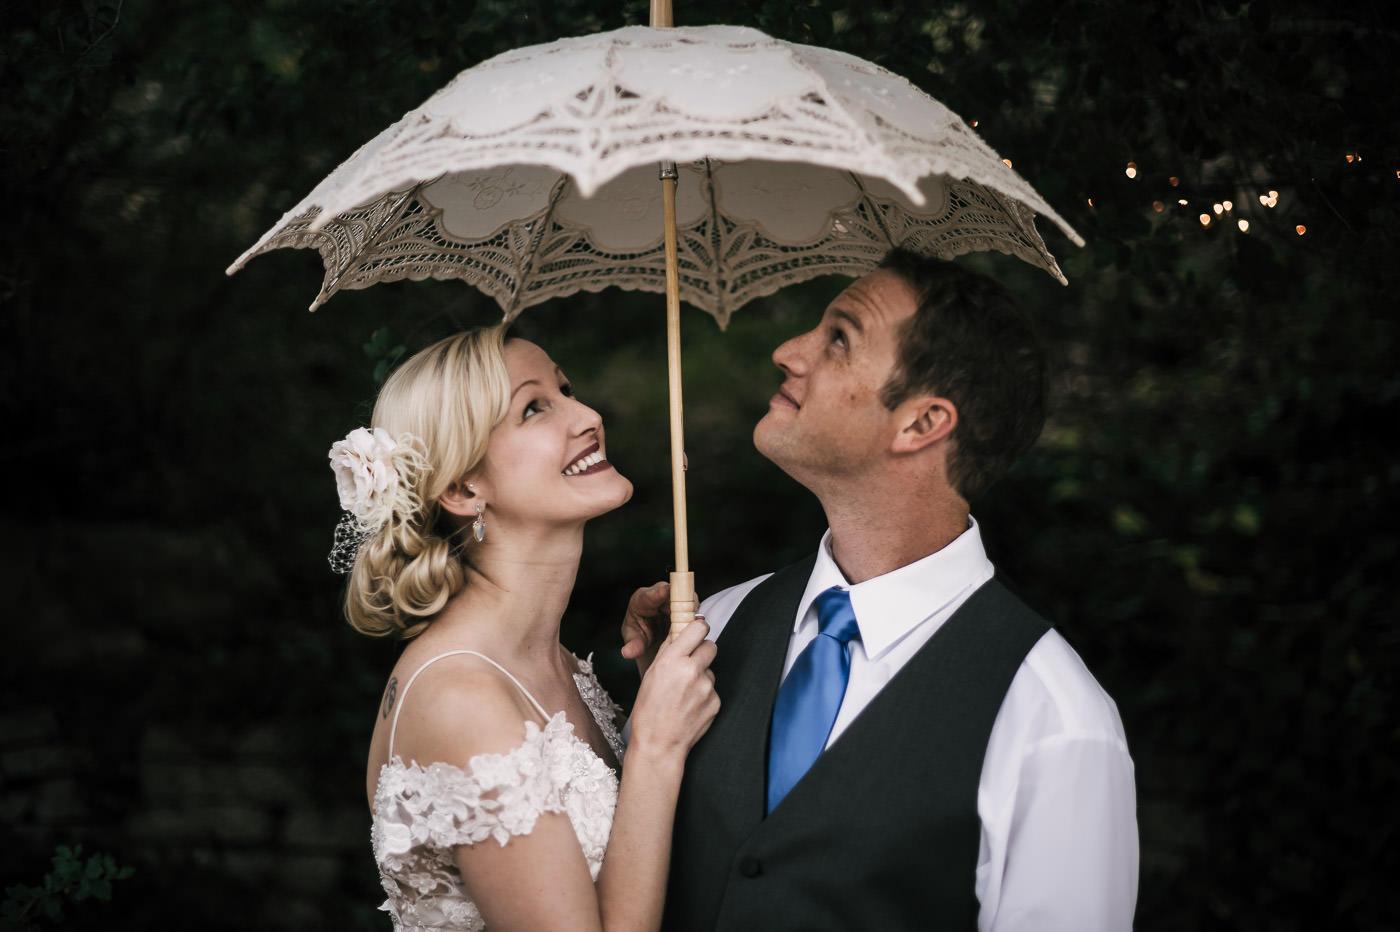 best wedding photograper in temecula california